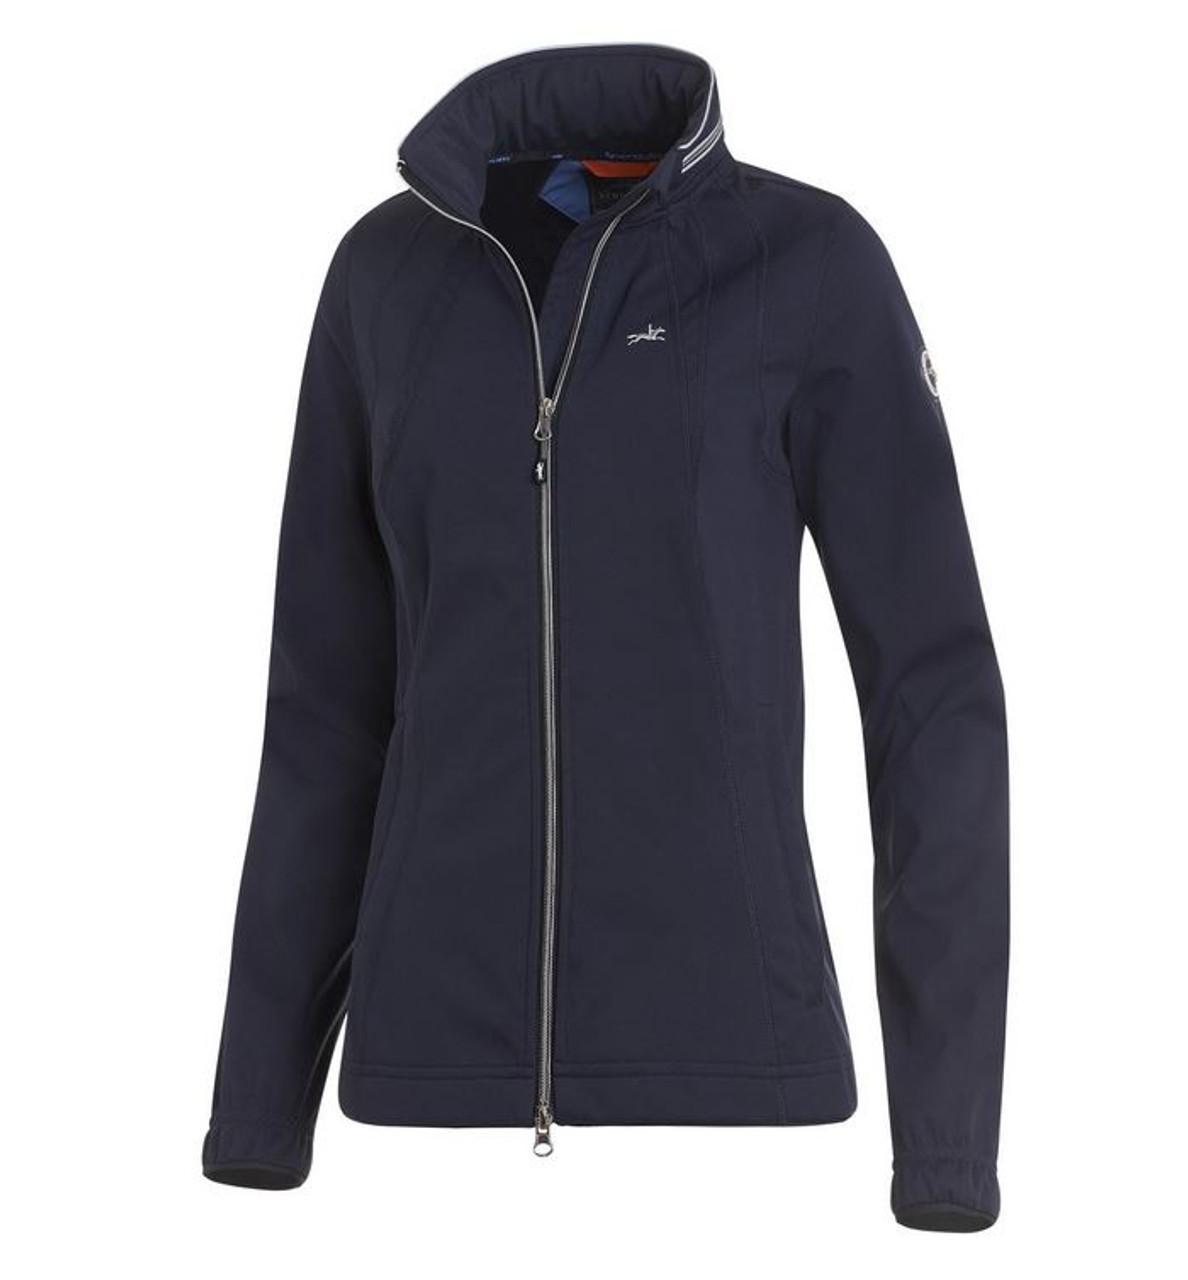 Graphite Blue Was £119.95 New Pikeur Flea Softshell Ladies Jacket